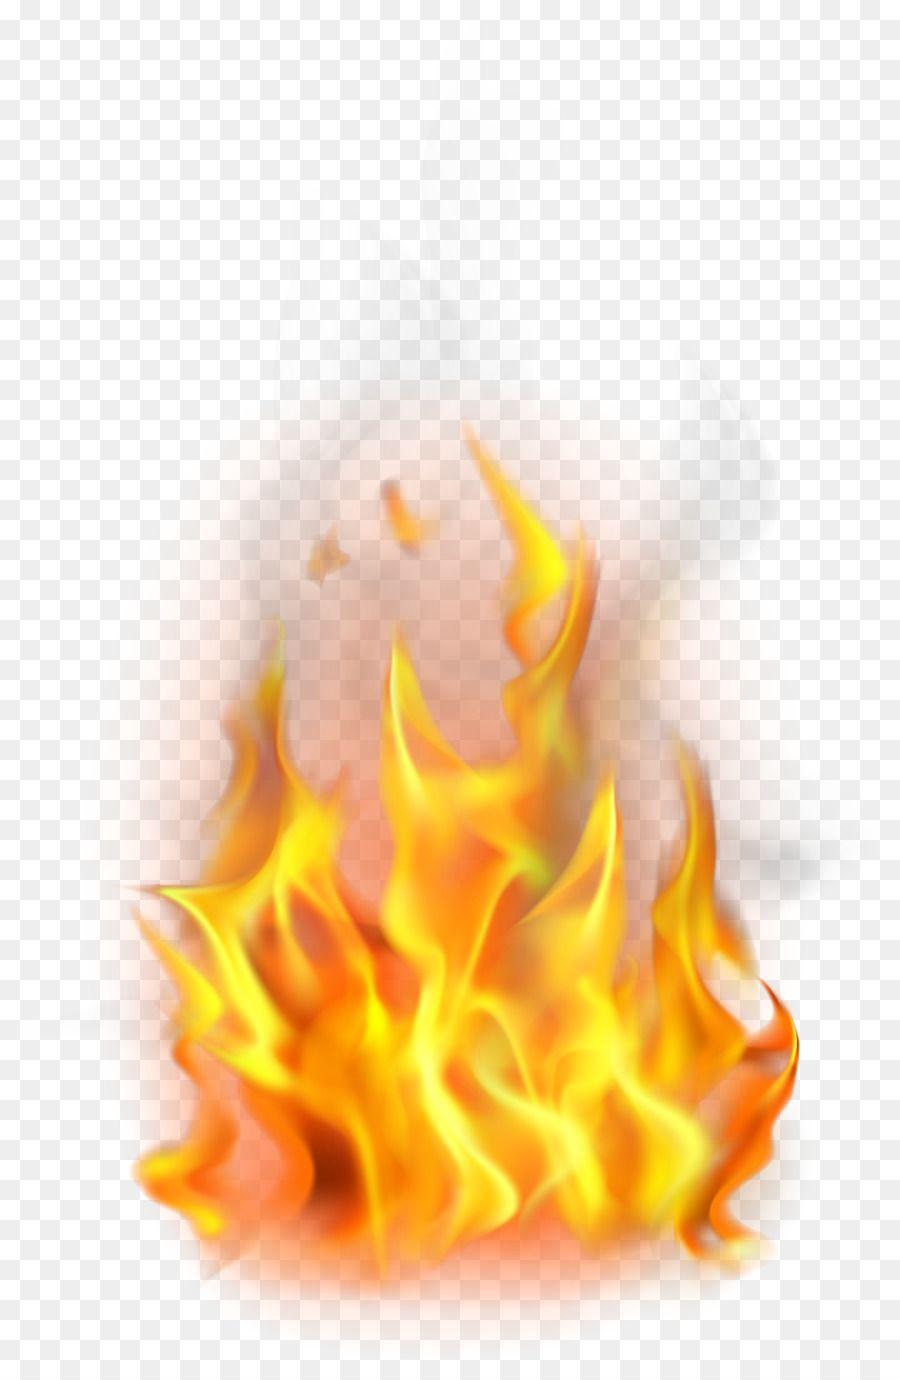 Fire Gif Transparent : transparent, Background, Frame, Animation,, Fireworks, Animation